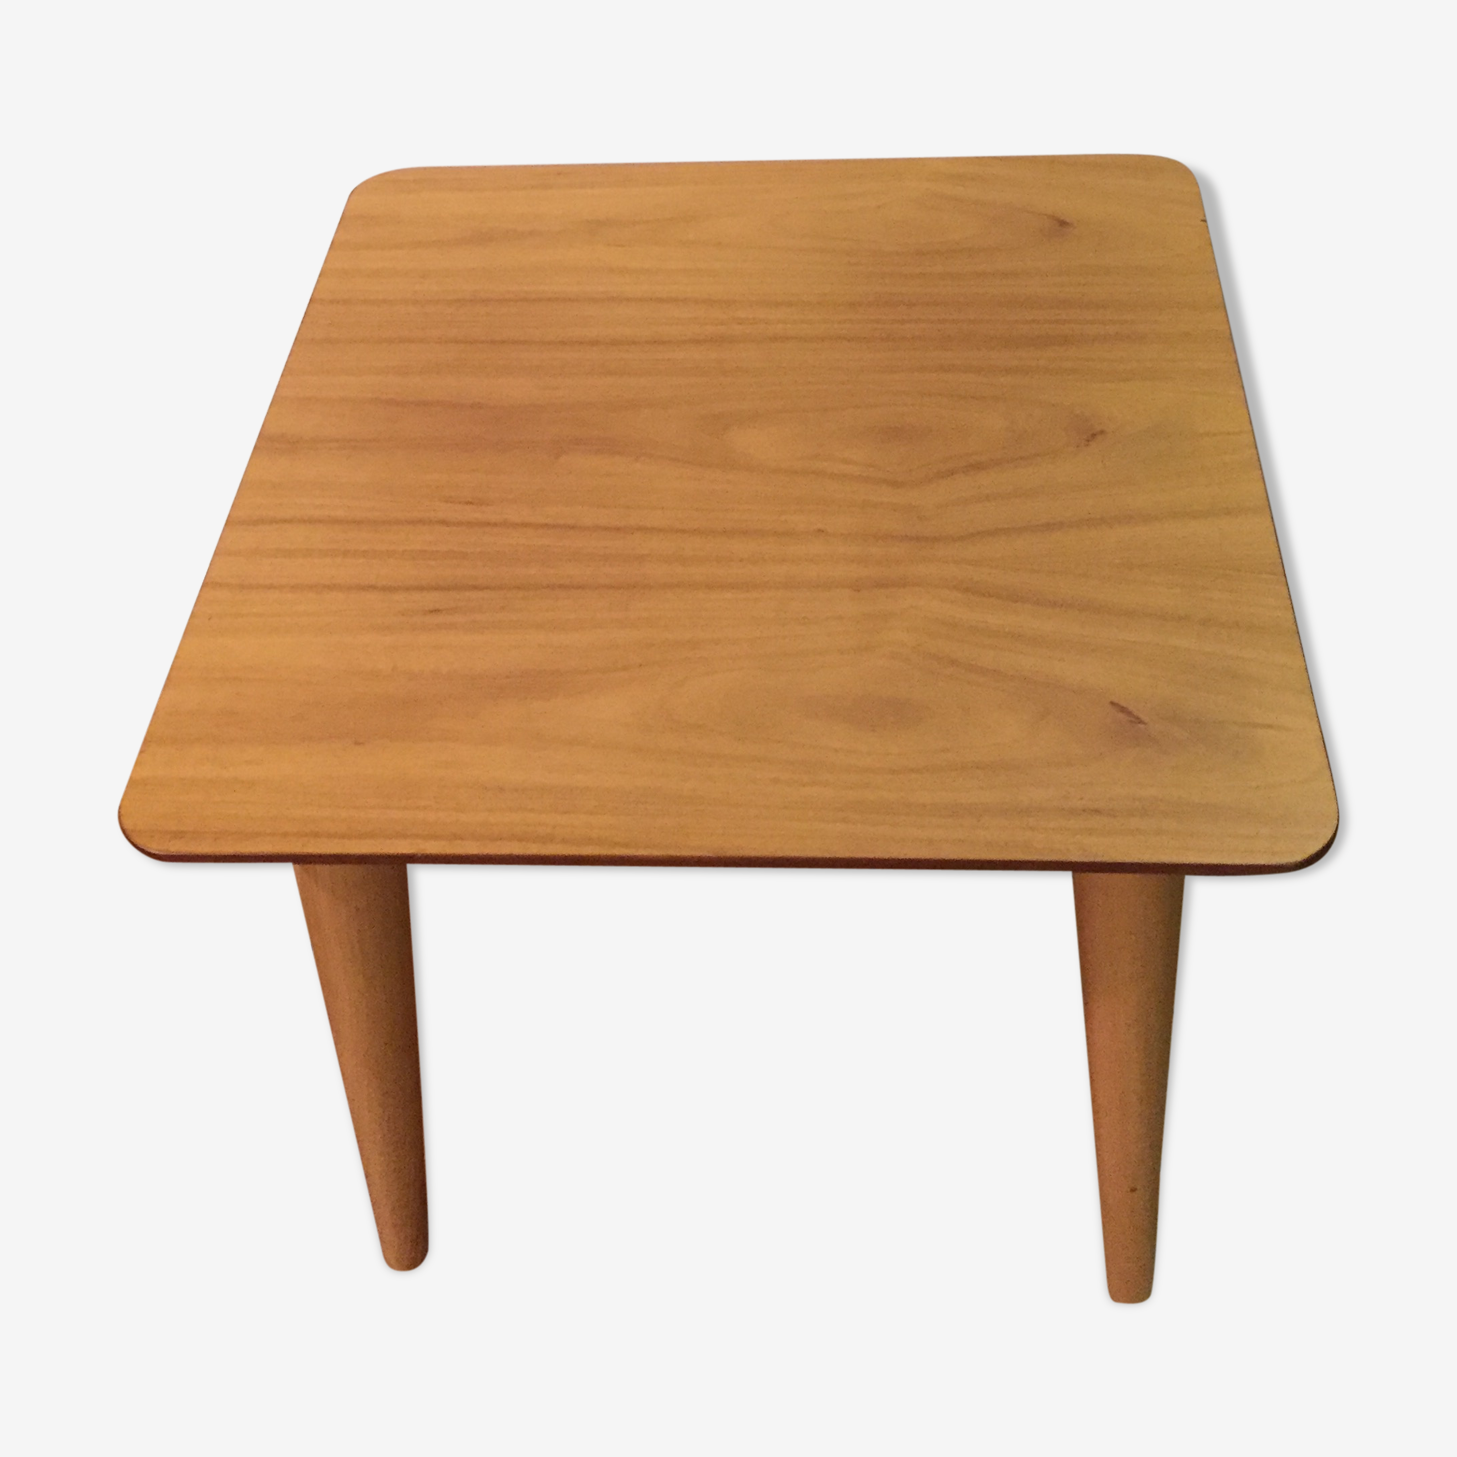 "Table basse ""M"" by Kann design"